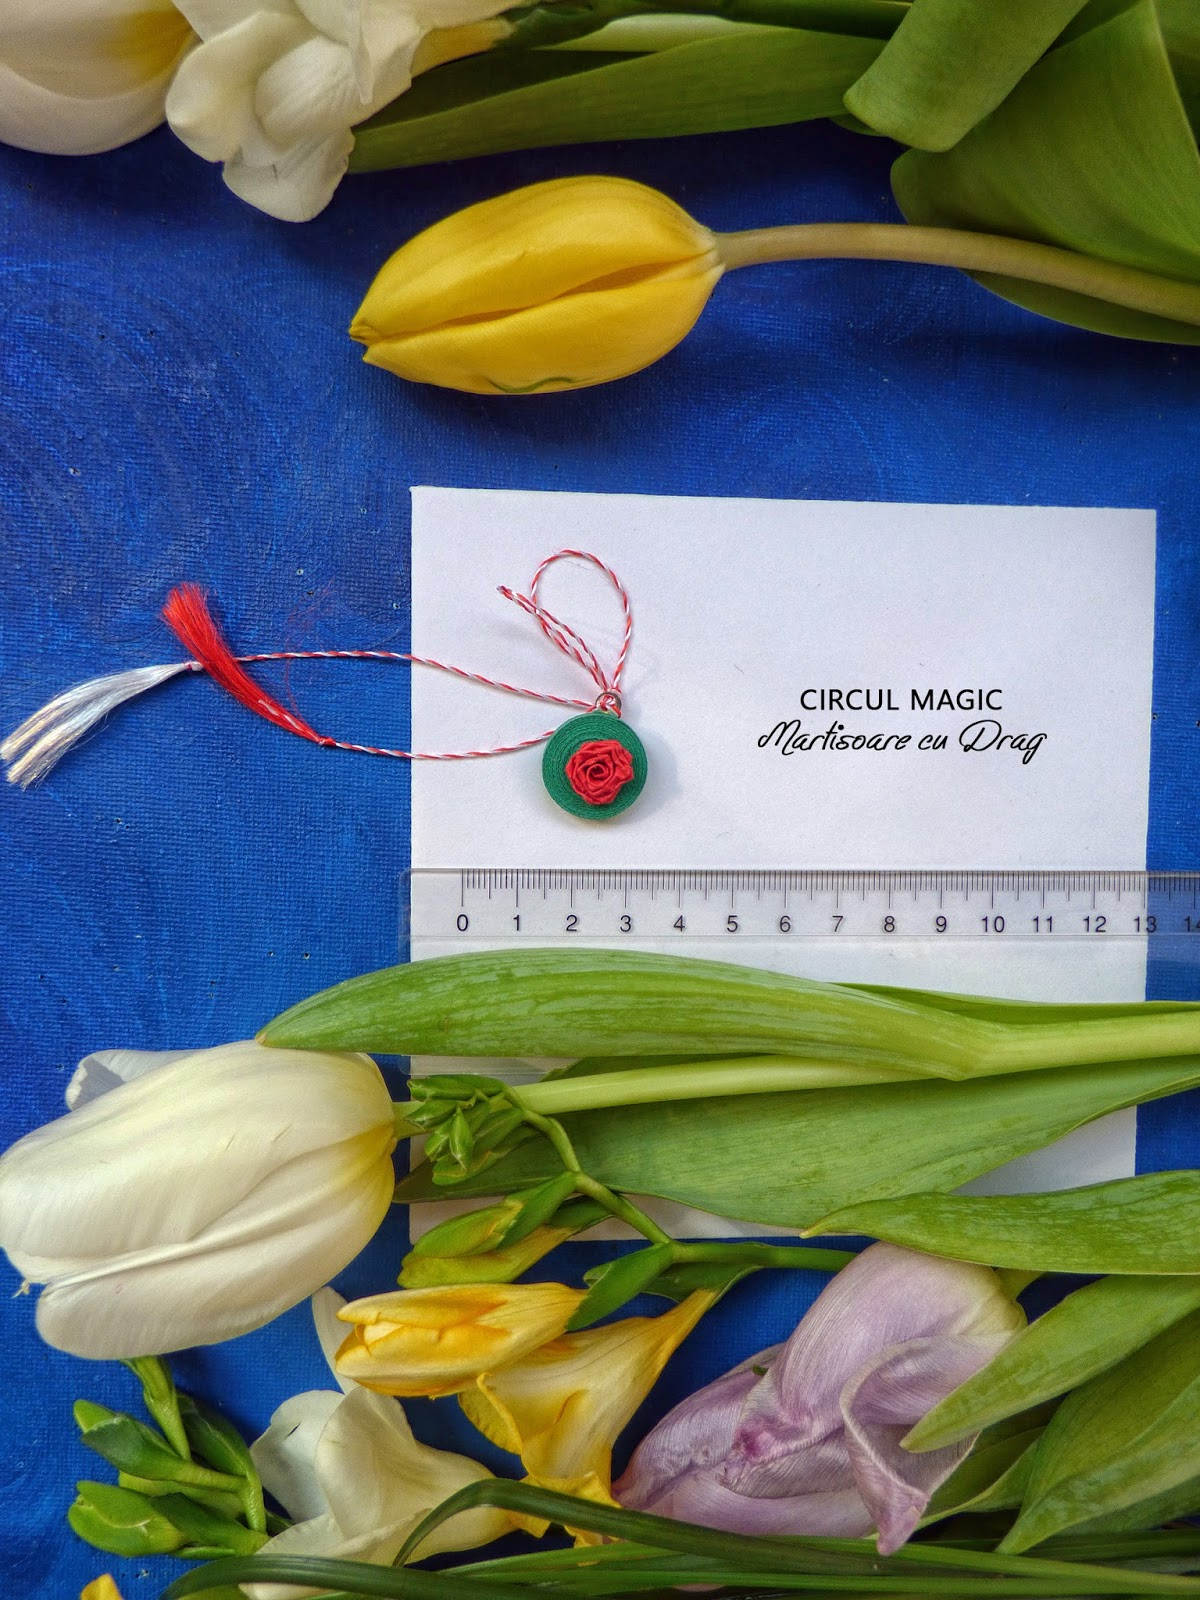 Martisoare Flori Quilling 2017 Trandafiri Circul Magic